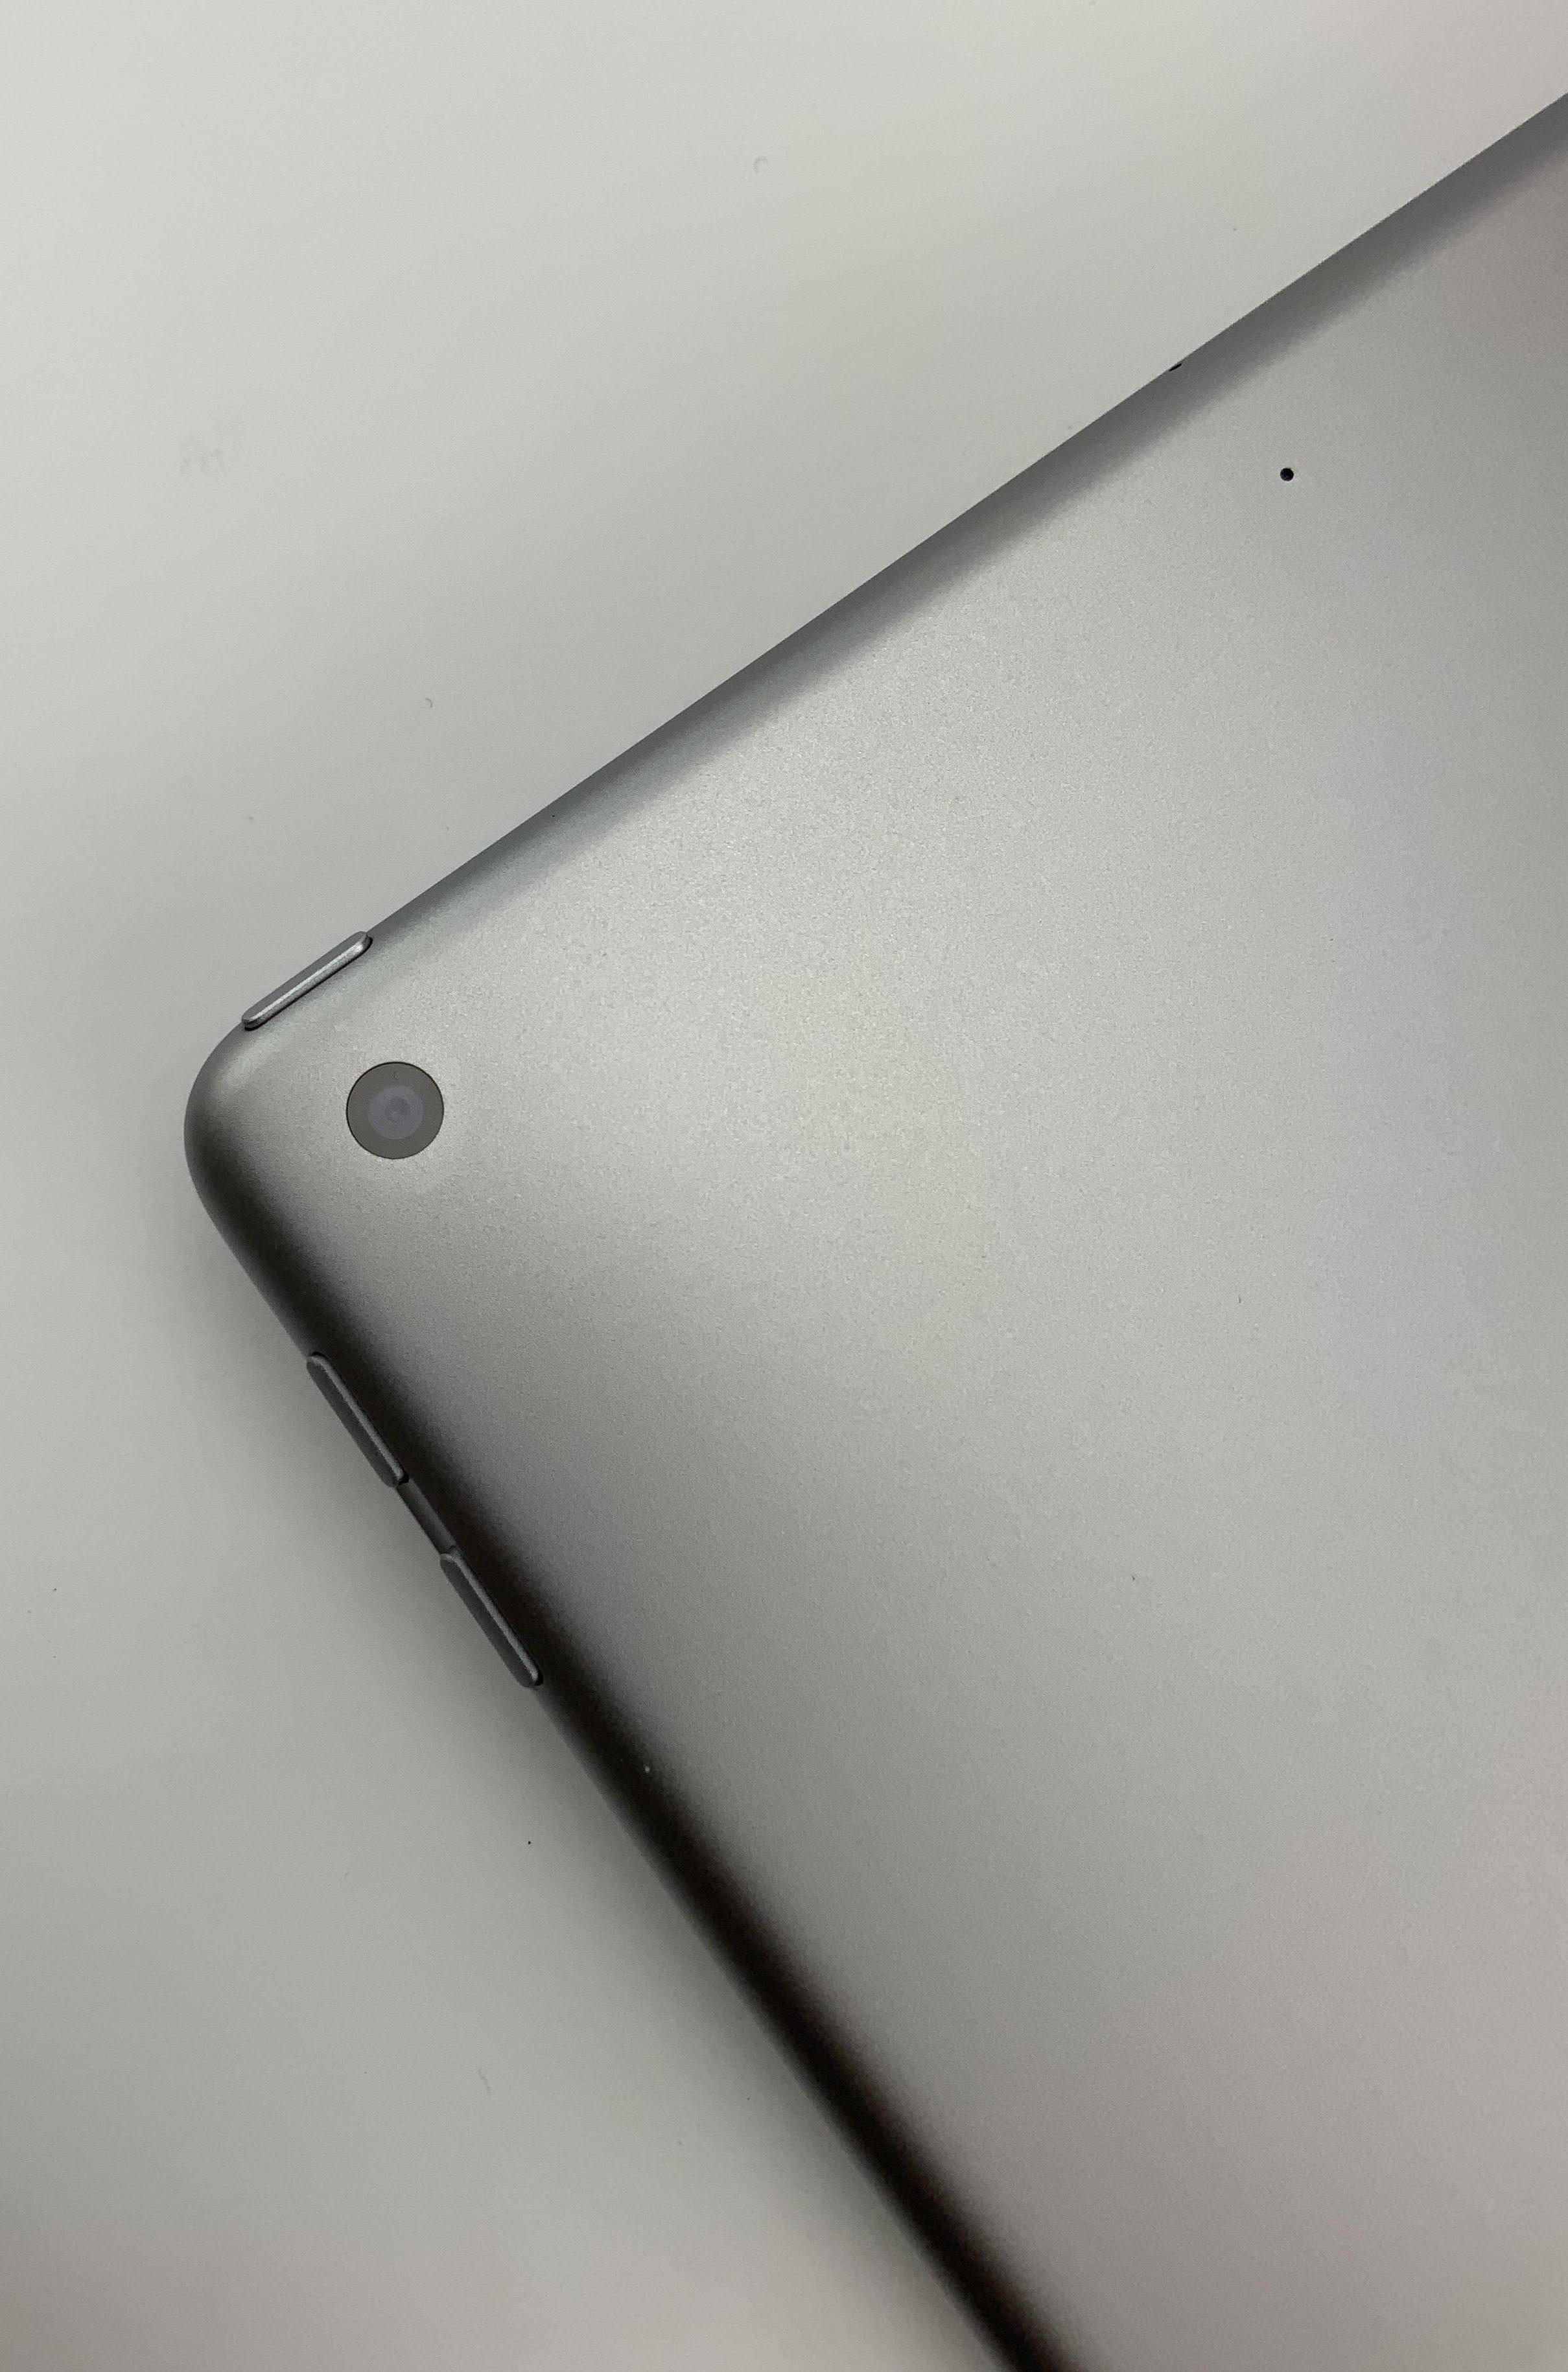 iPad 6 Wi-Fi 128GB, 128GB, Space Gray, bild 3